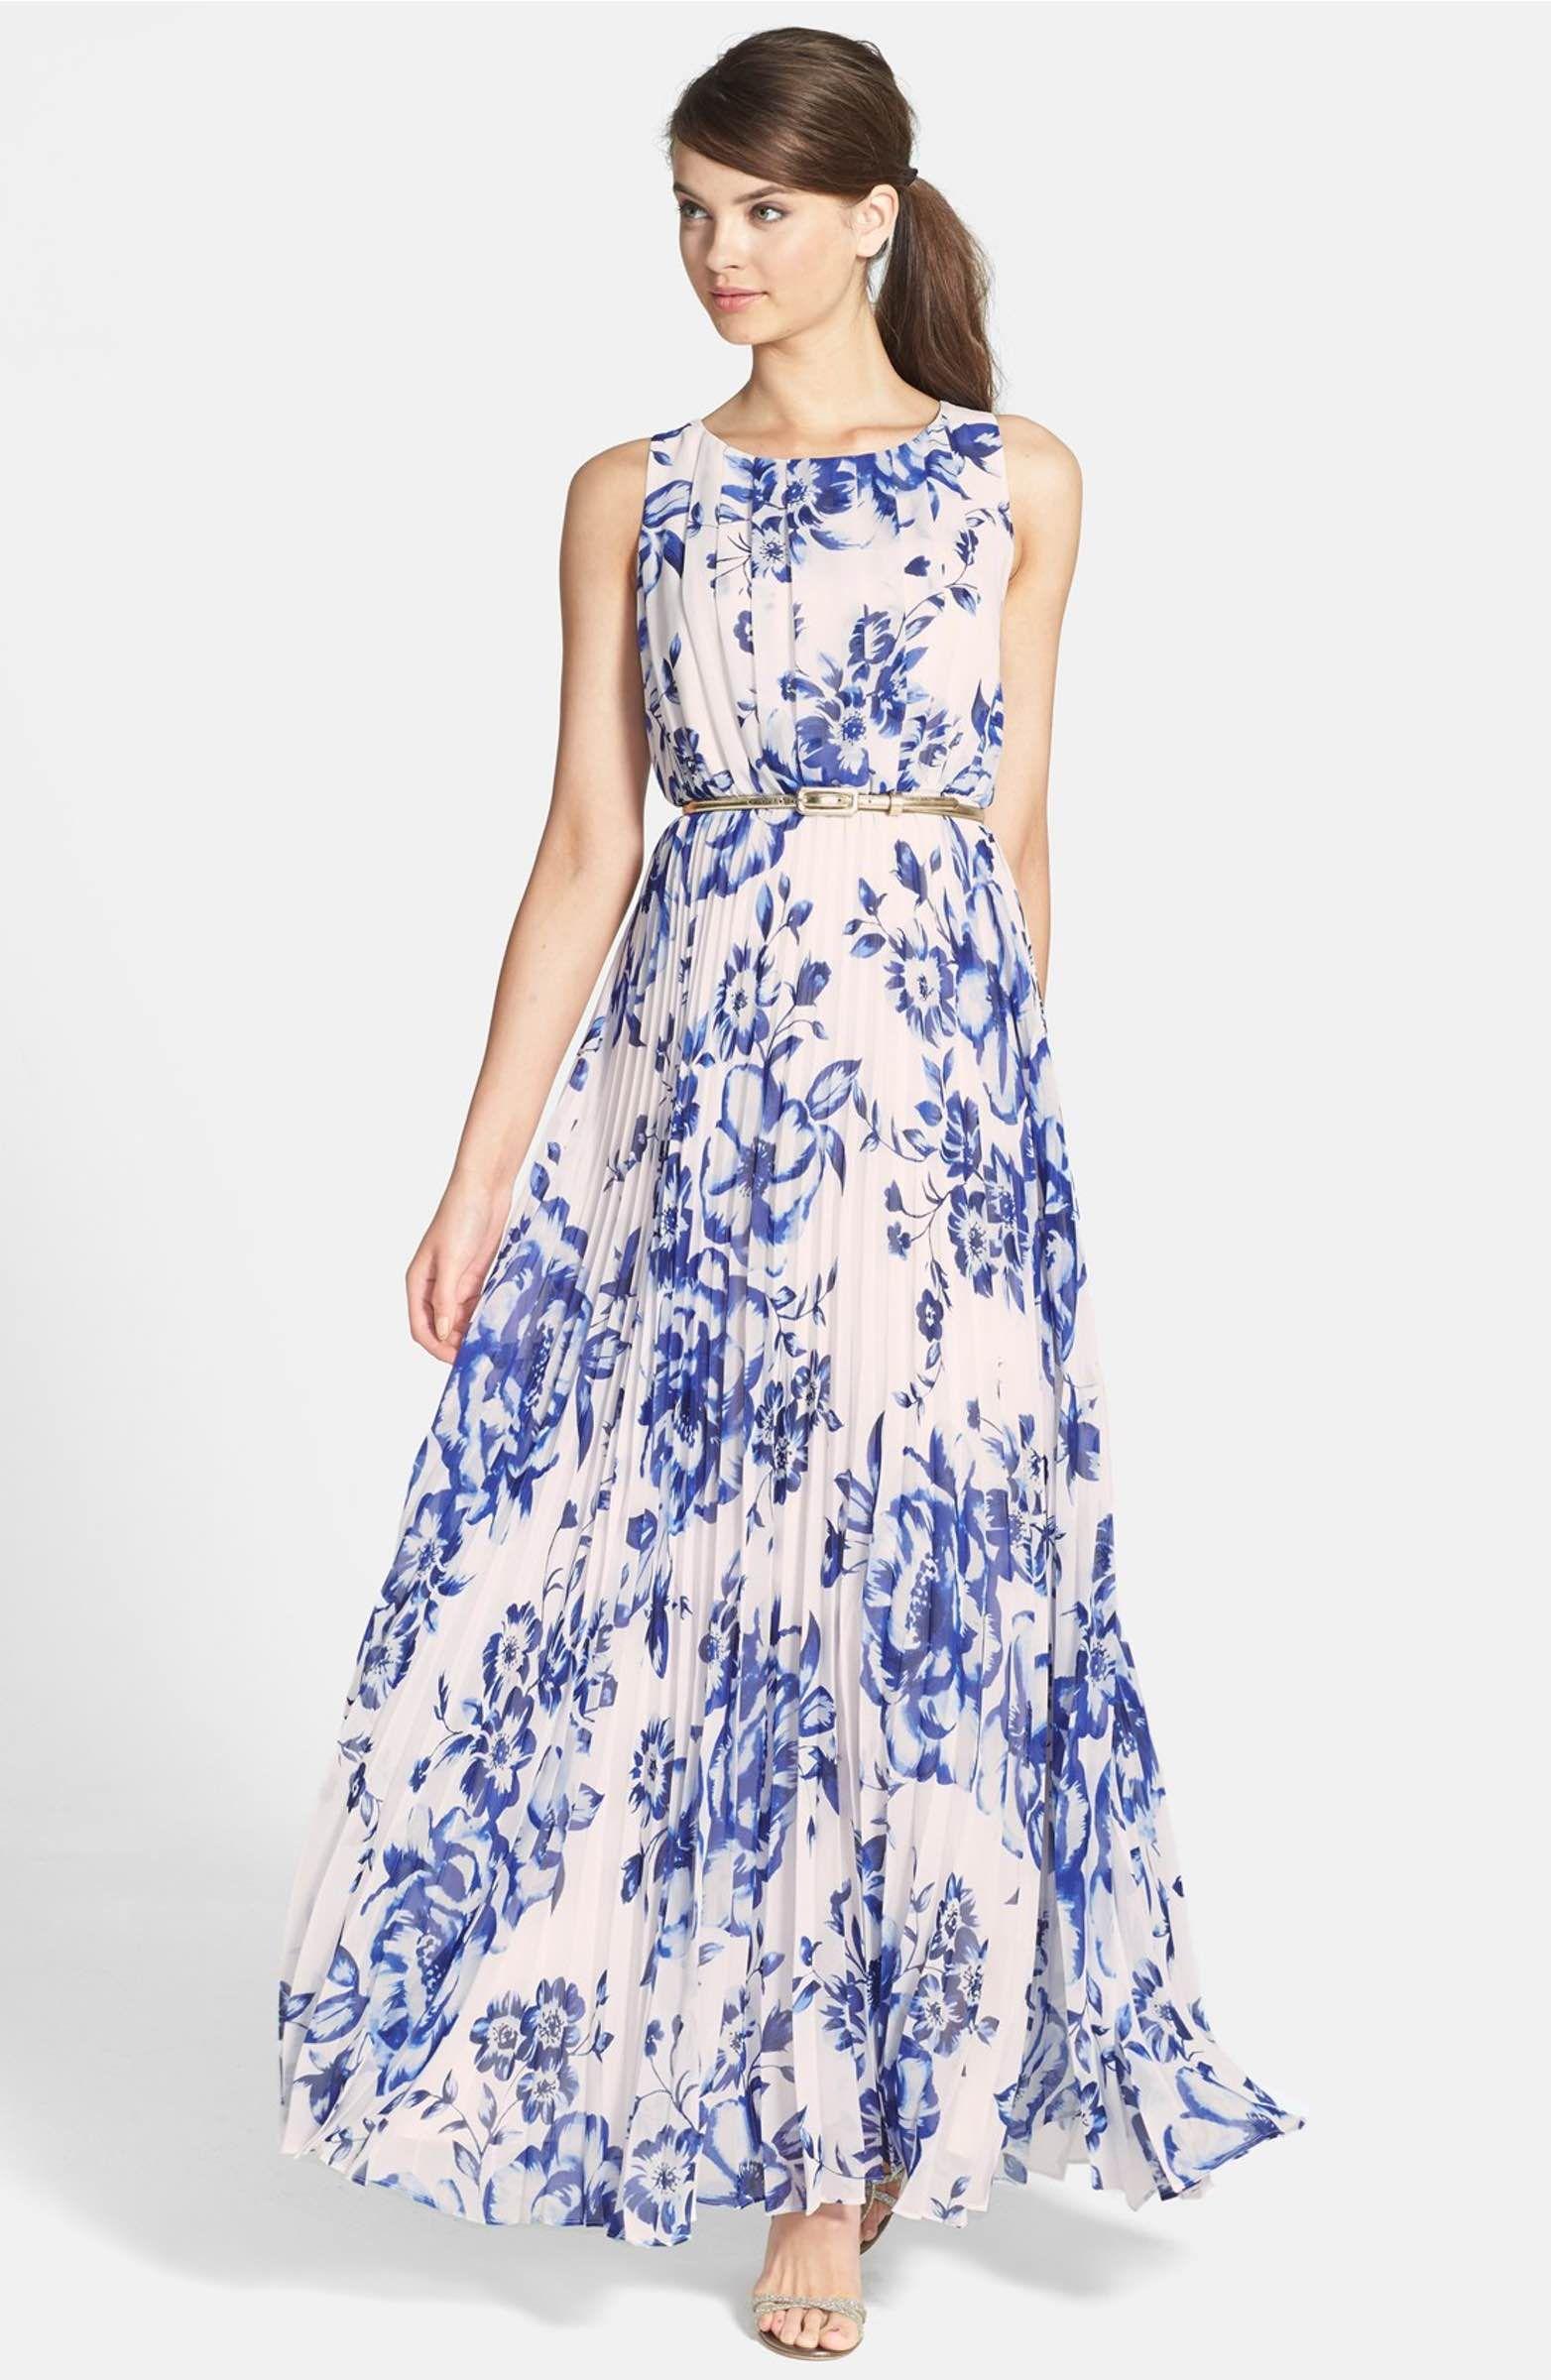 Main image eliza j chiffon maxi dress regular u petite dresses